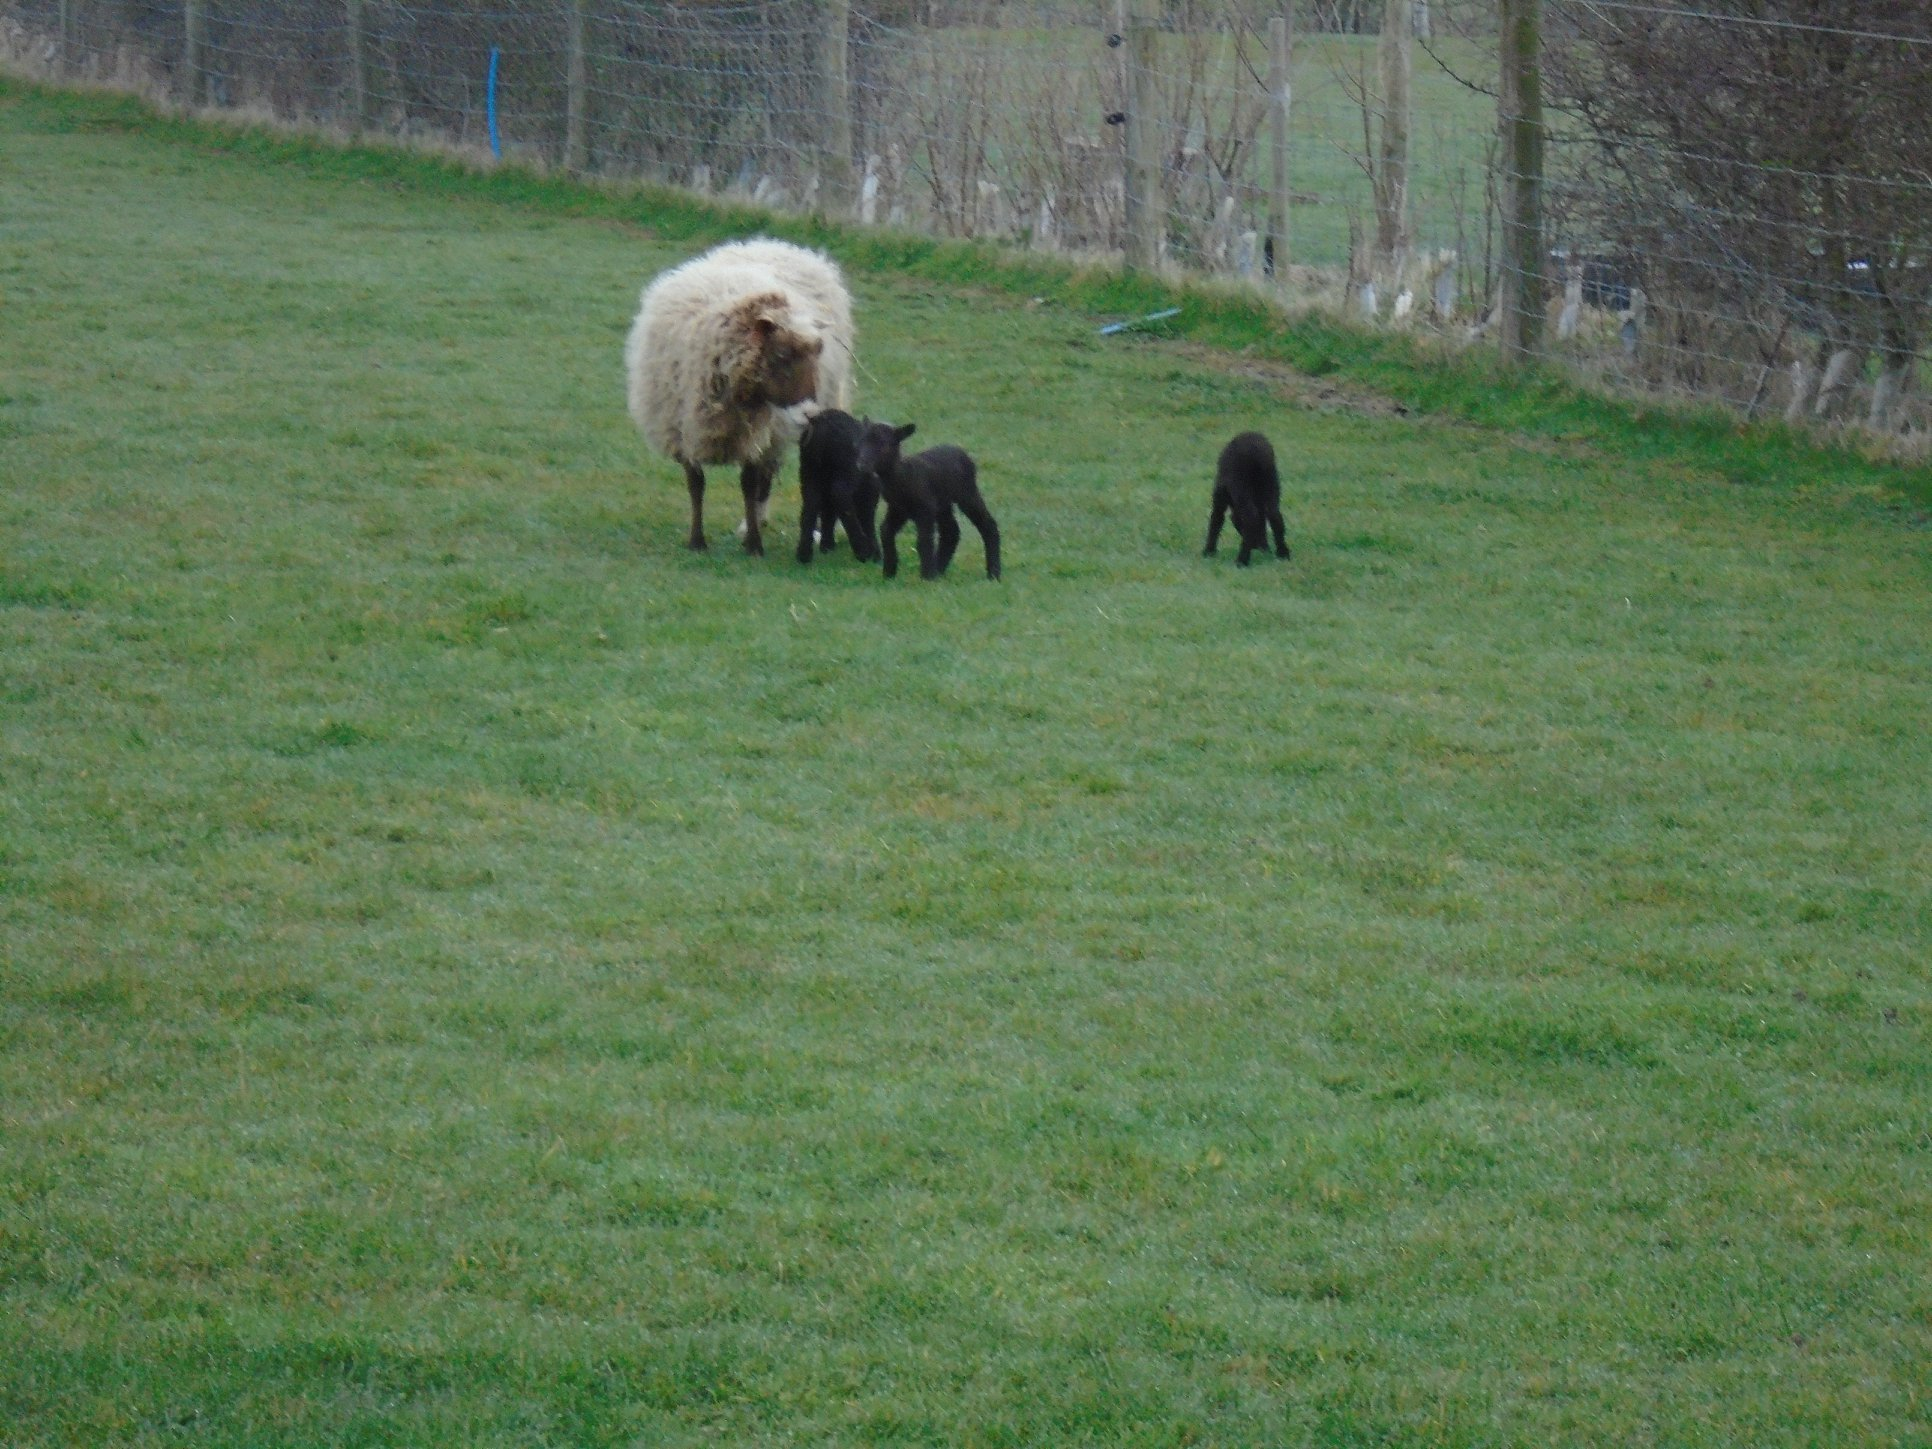 lambs BB mar 2018 owena.jpg